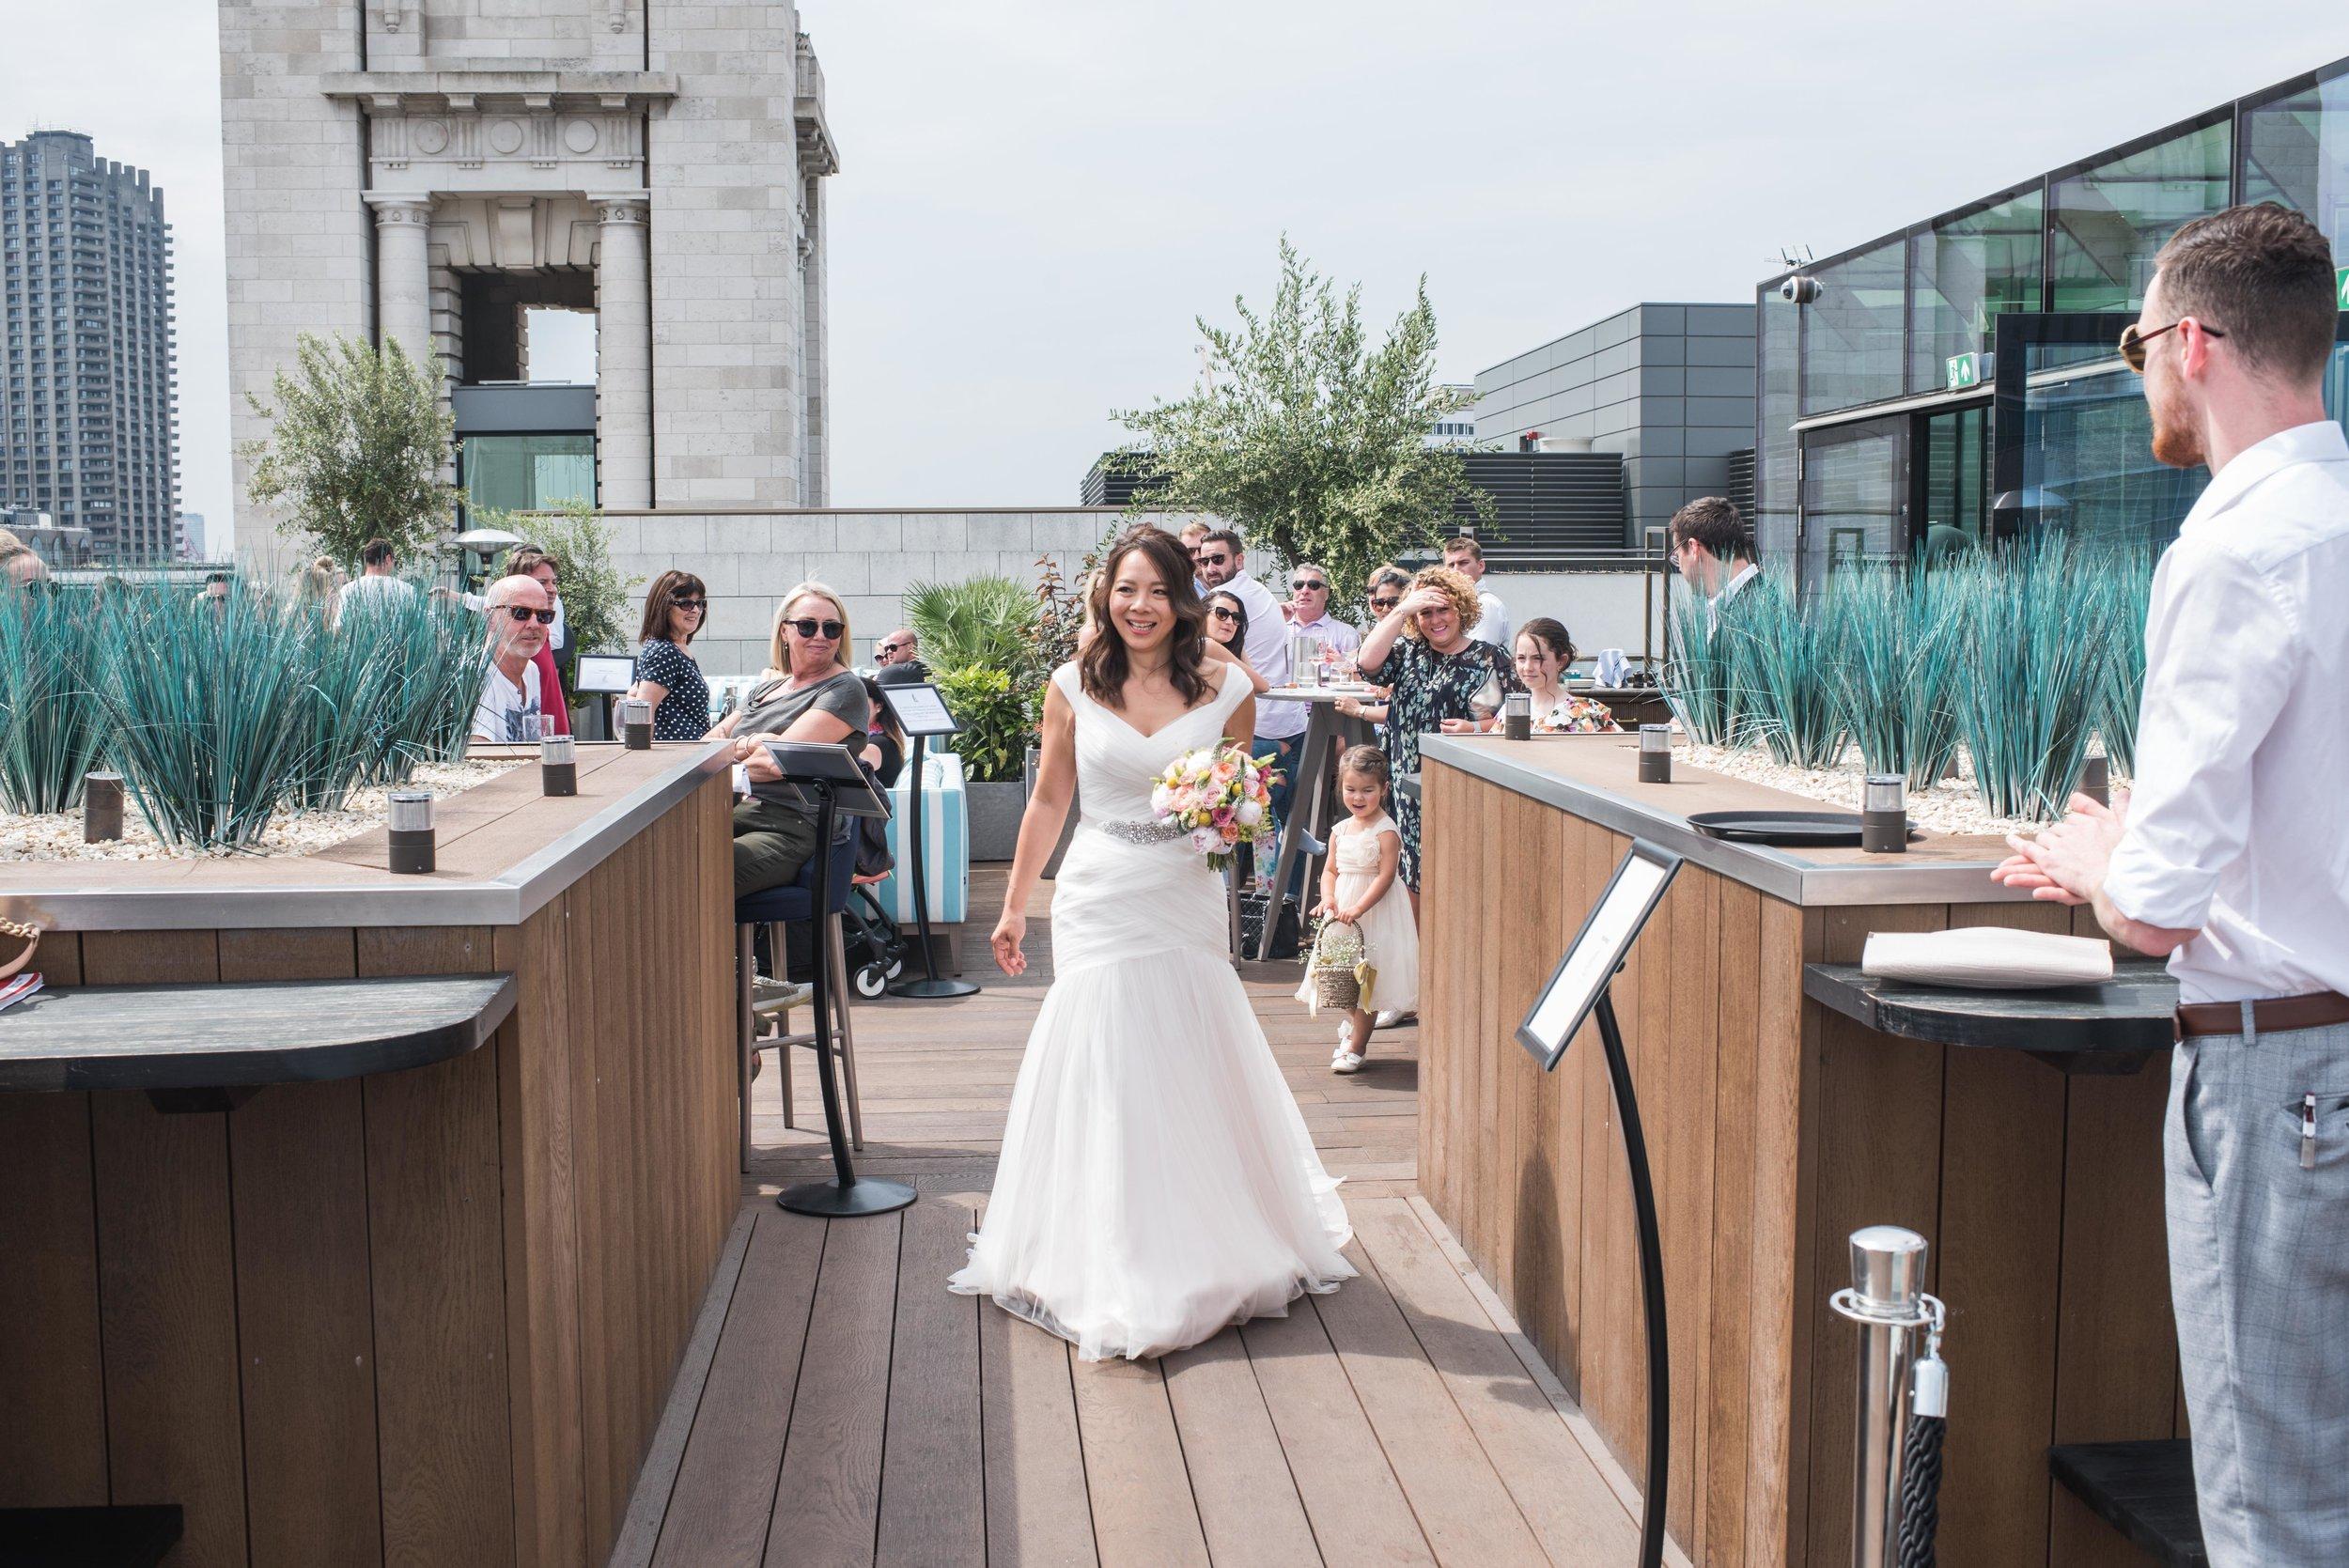 D&M_Marylebone Town Hall Wedding (24 of 239).jpg